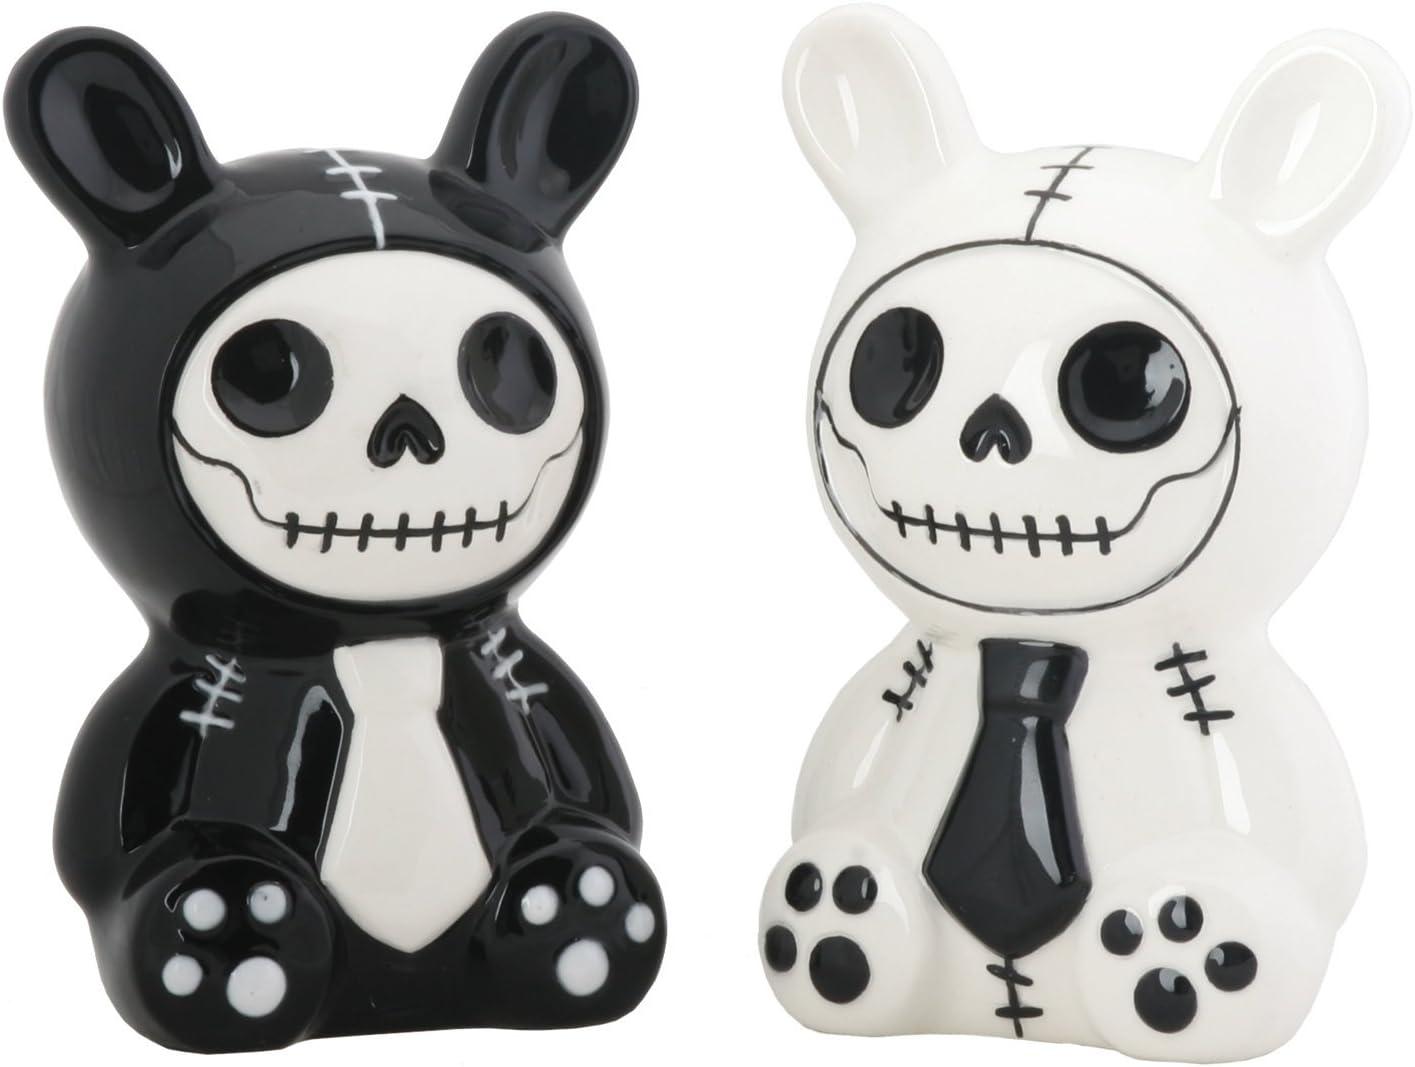 SUMMIT COLLECTION Furrybones Black and White Bunny Bun Bun Ceramic Salt N Pepper Shaker